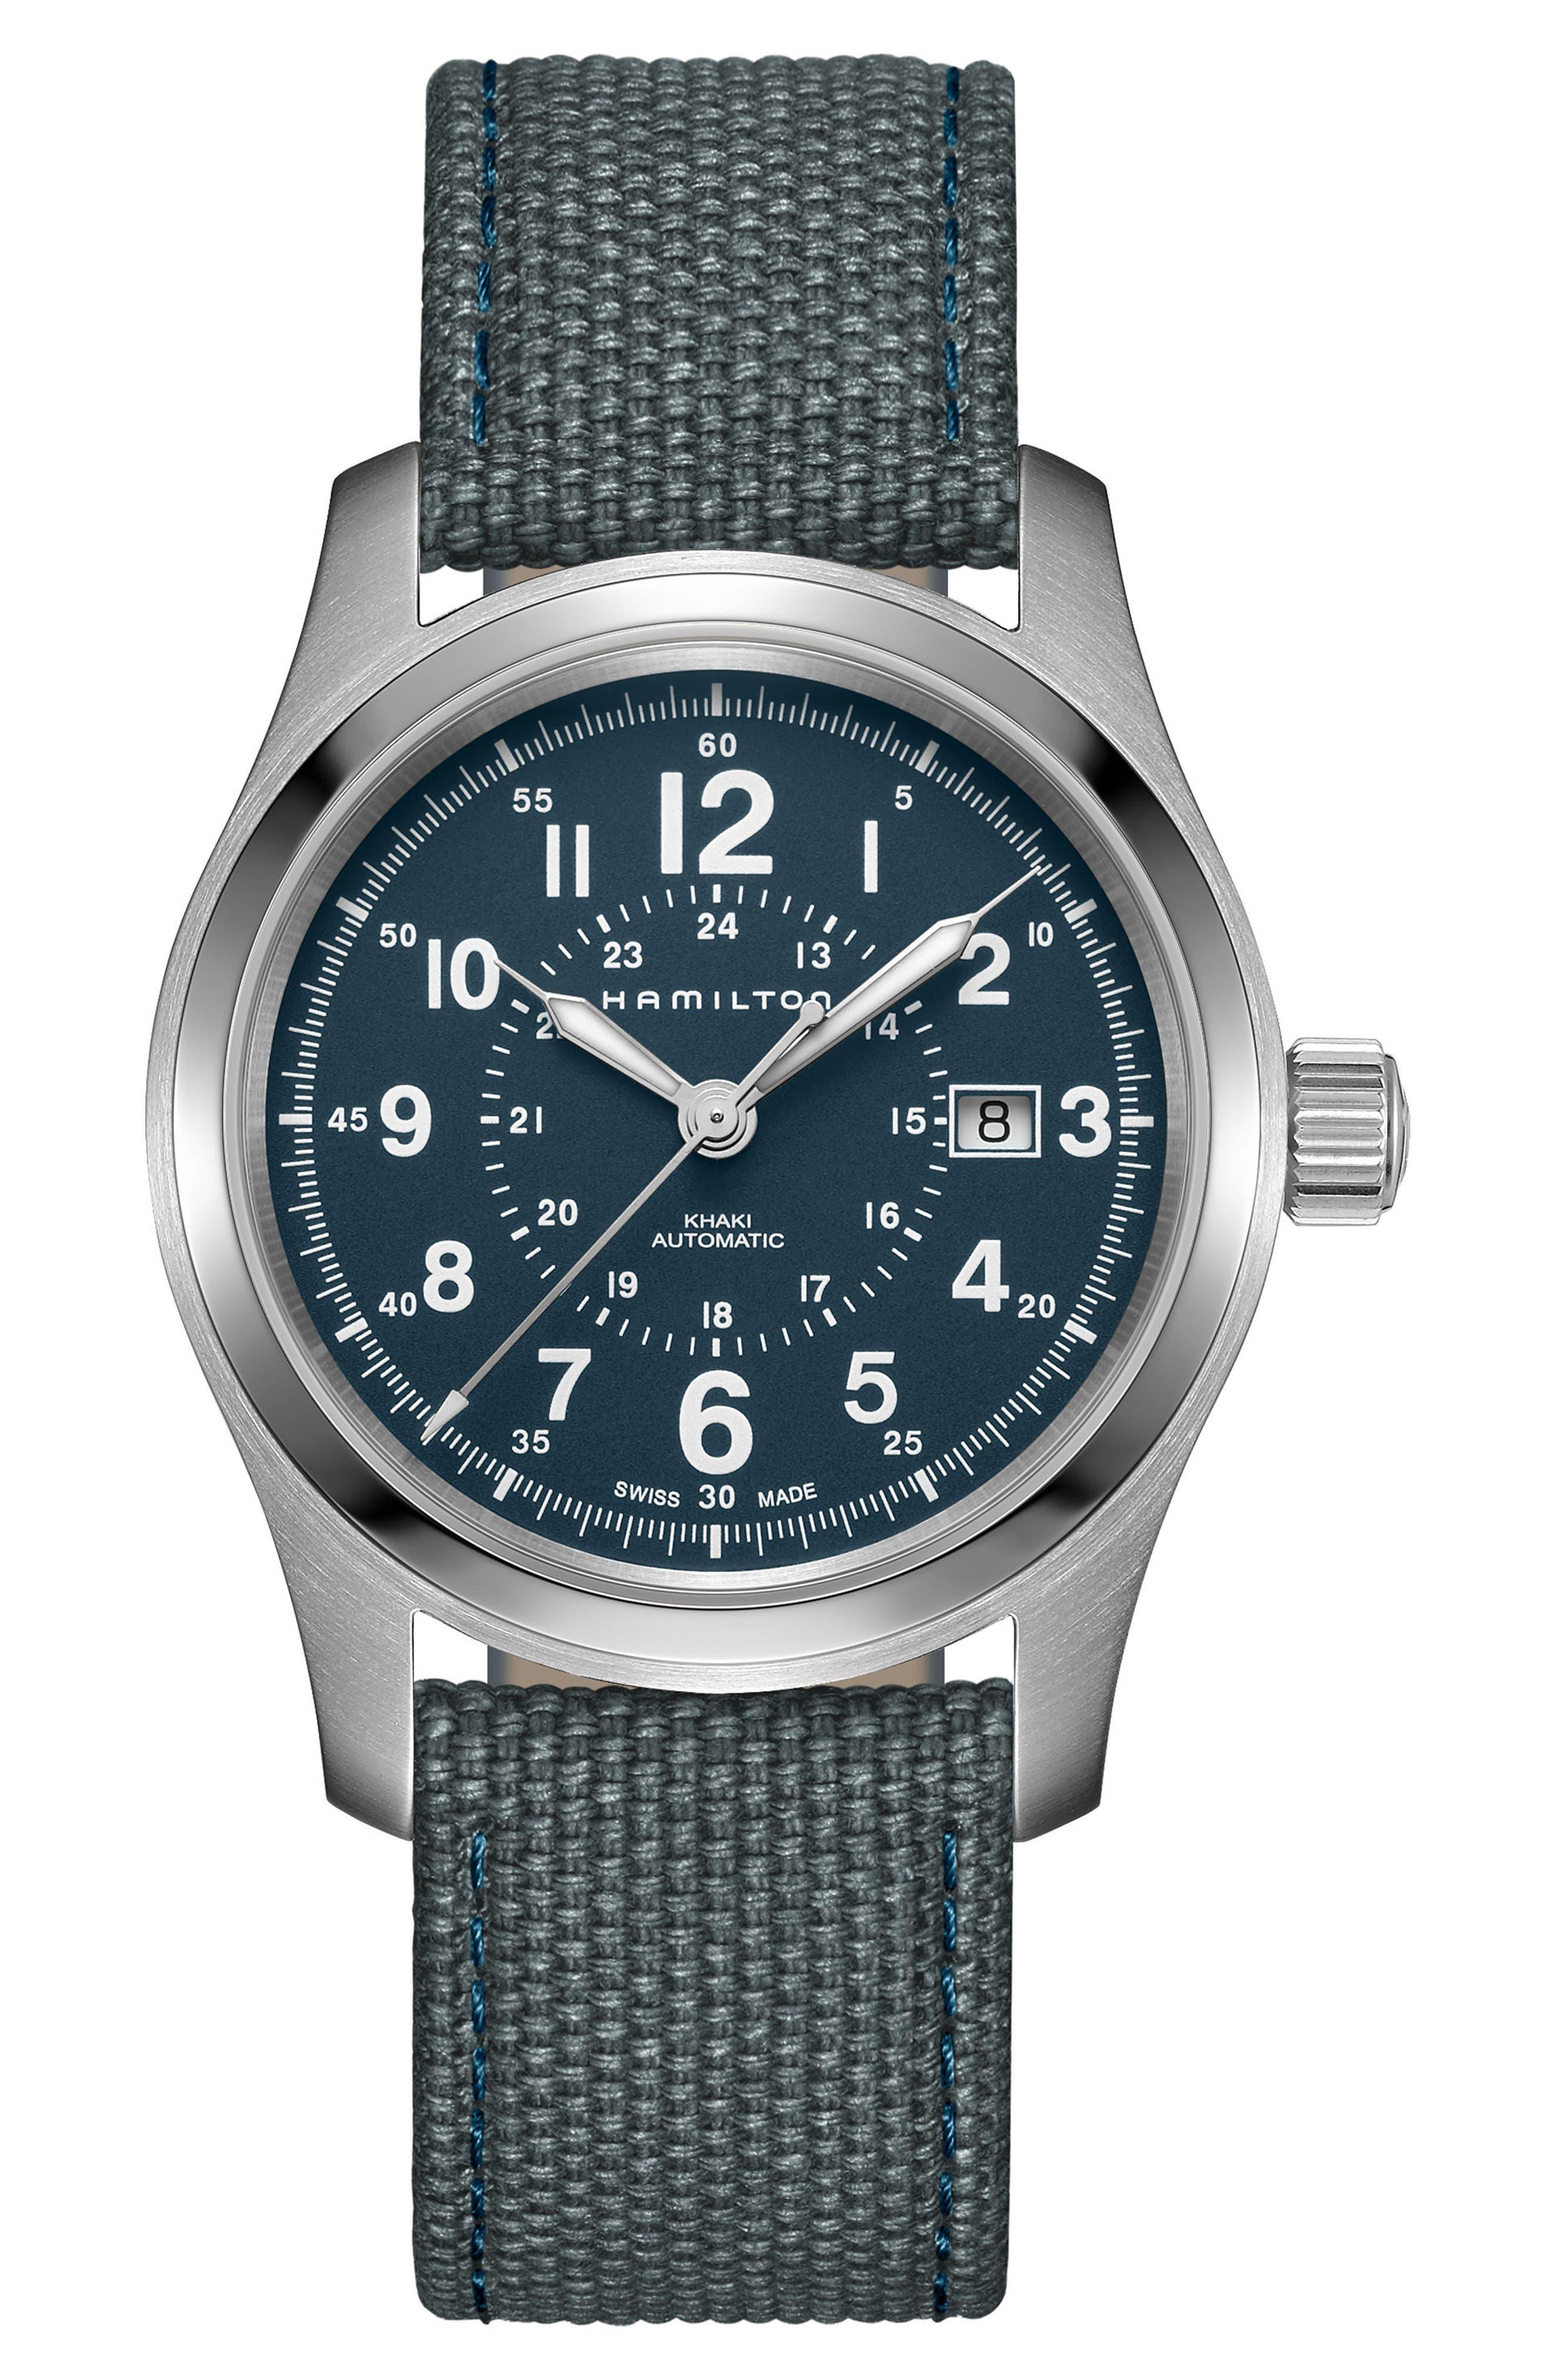 HAMILTON Khaki Field Automatic Canvas Strap Watch, 42mm